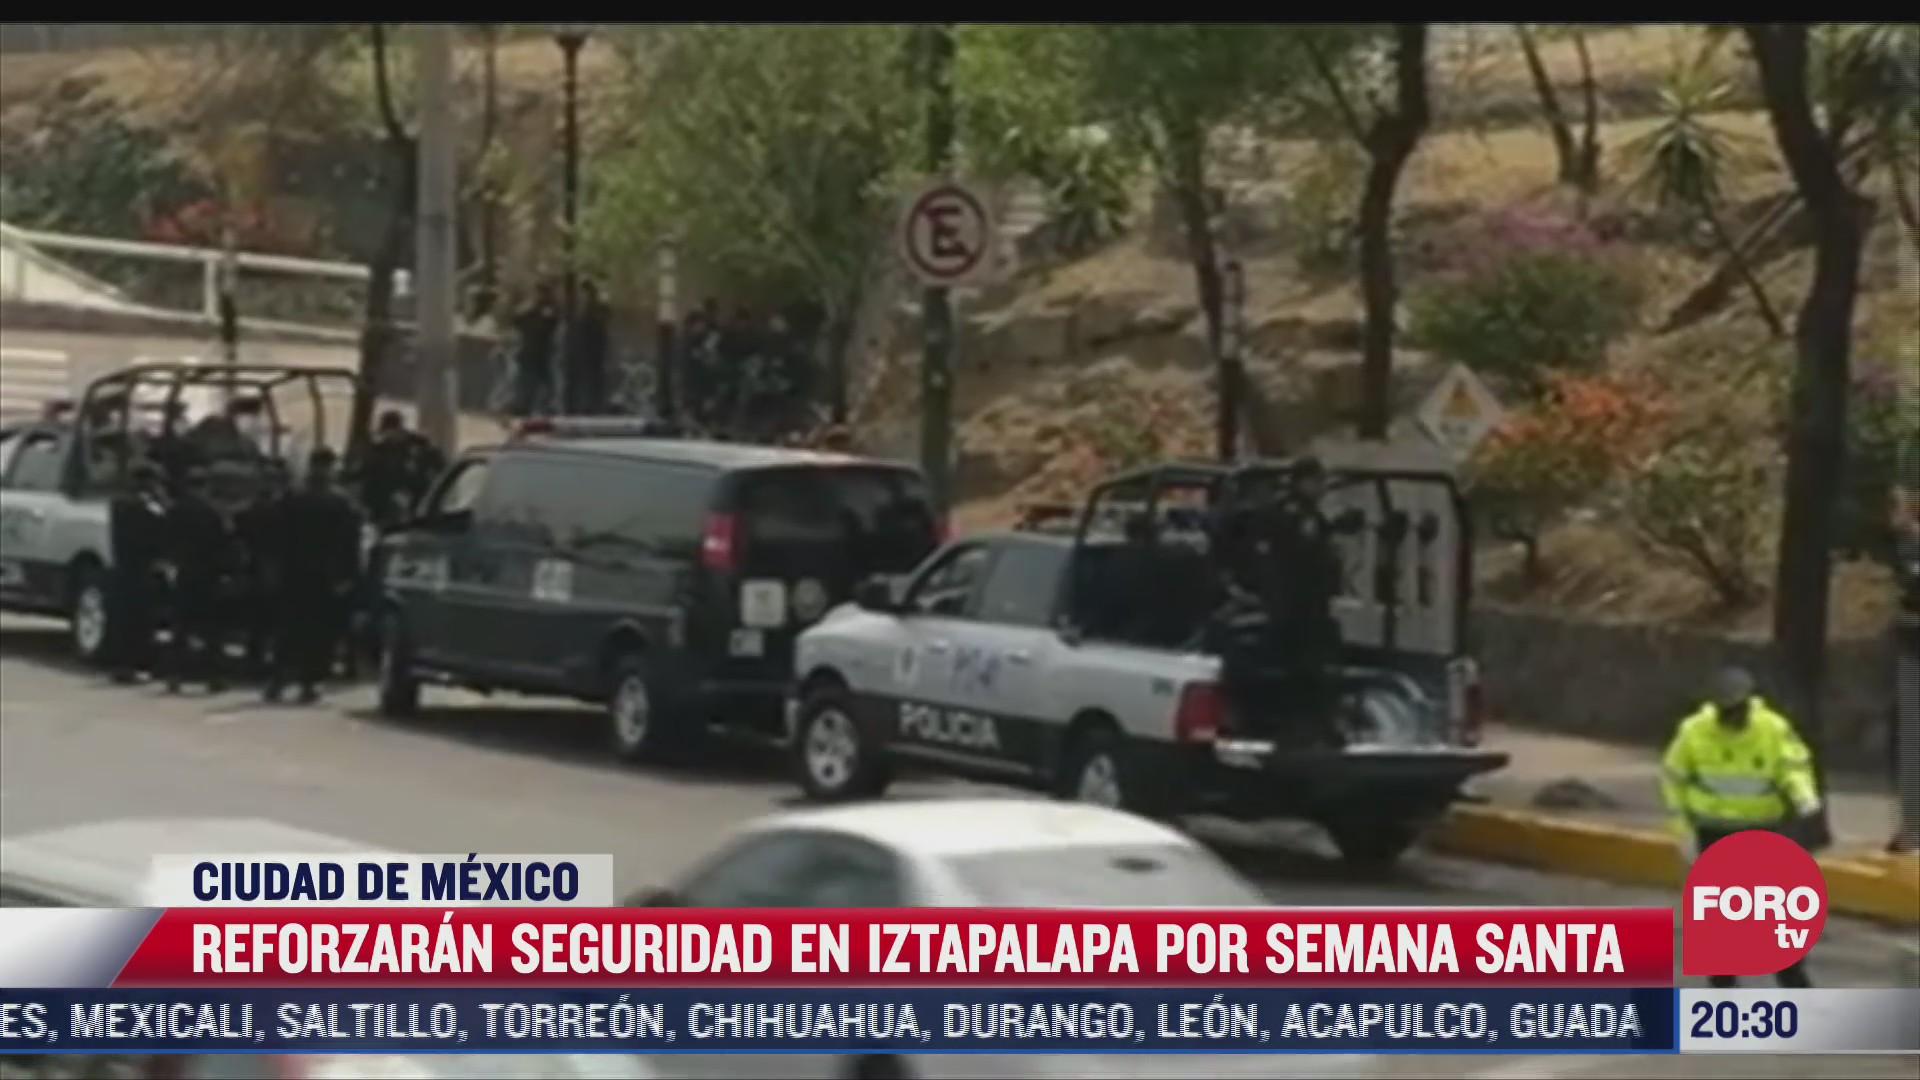 operativo de seguridad por semana santa en iztapalapa